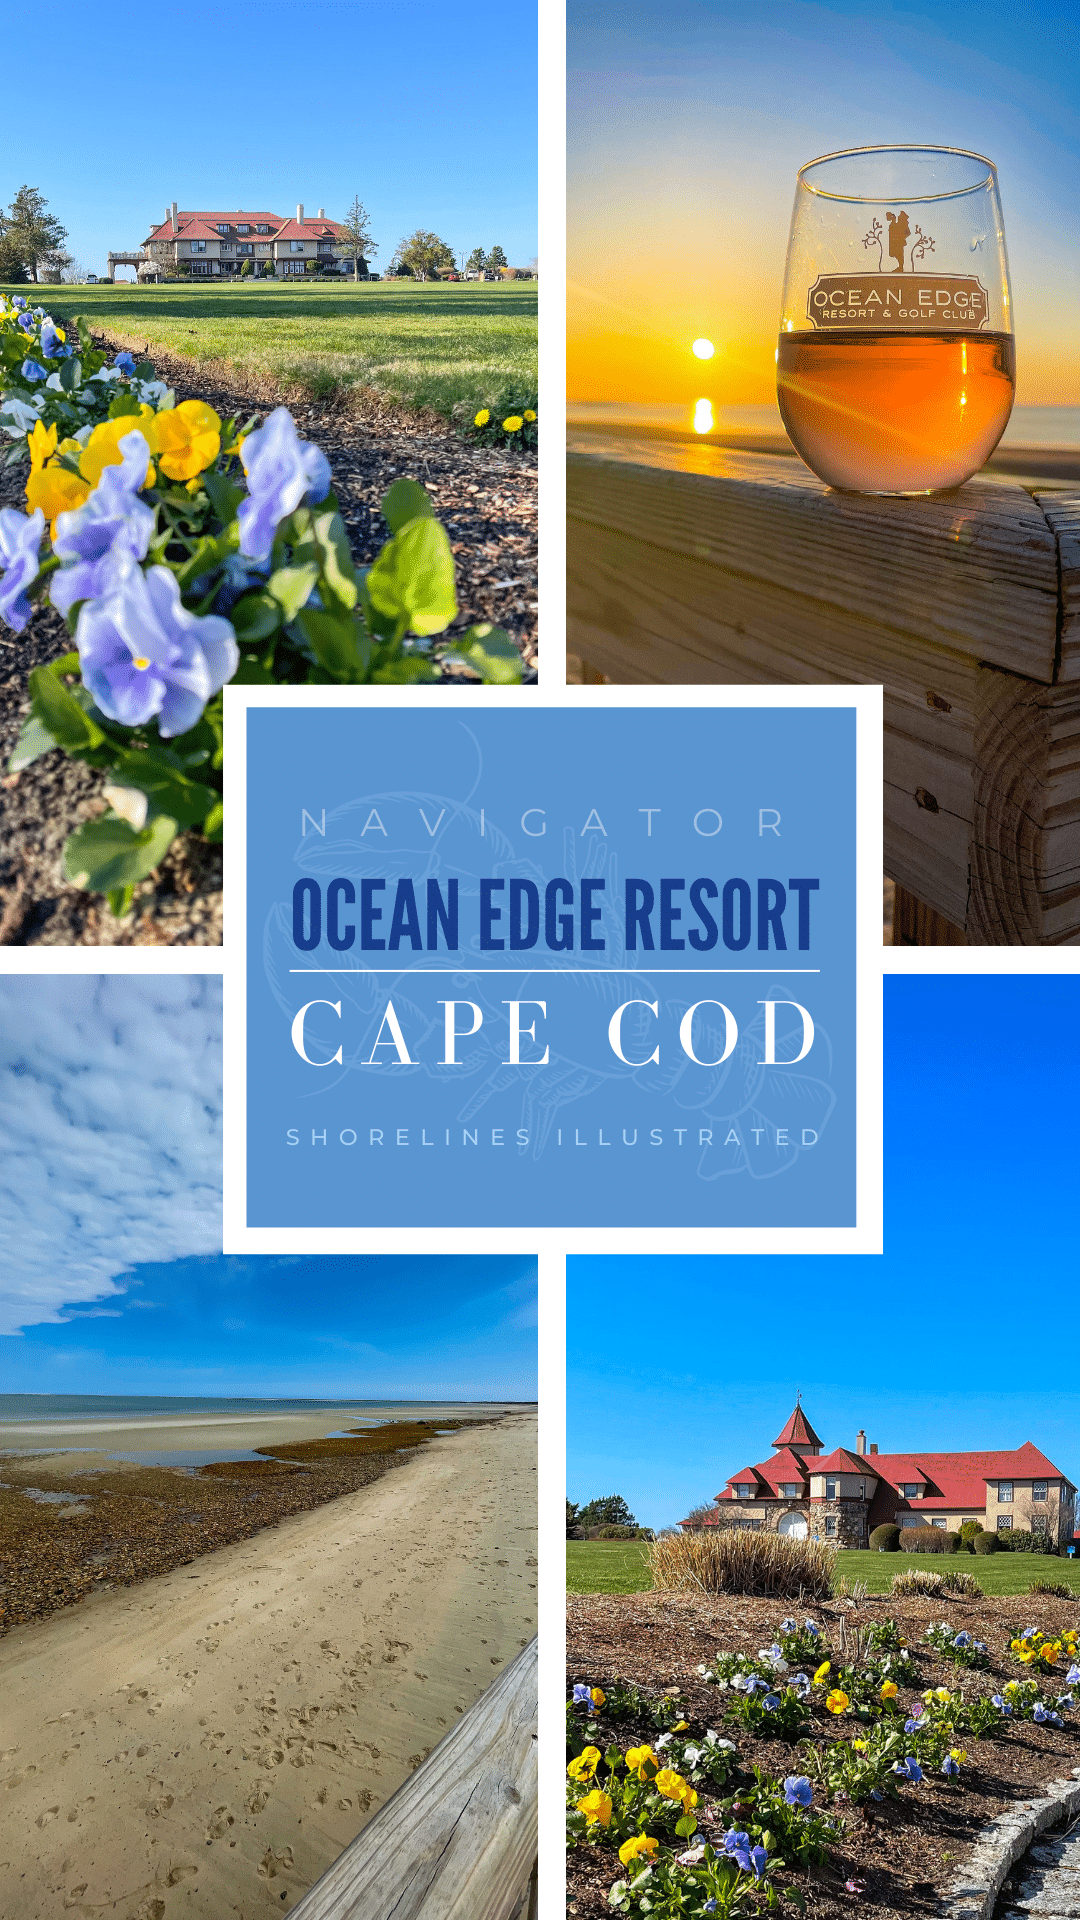 ocean-edge-resort-cape-cod-1